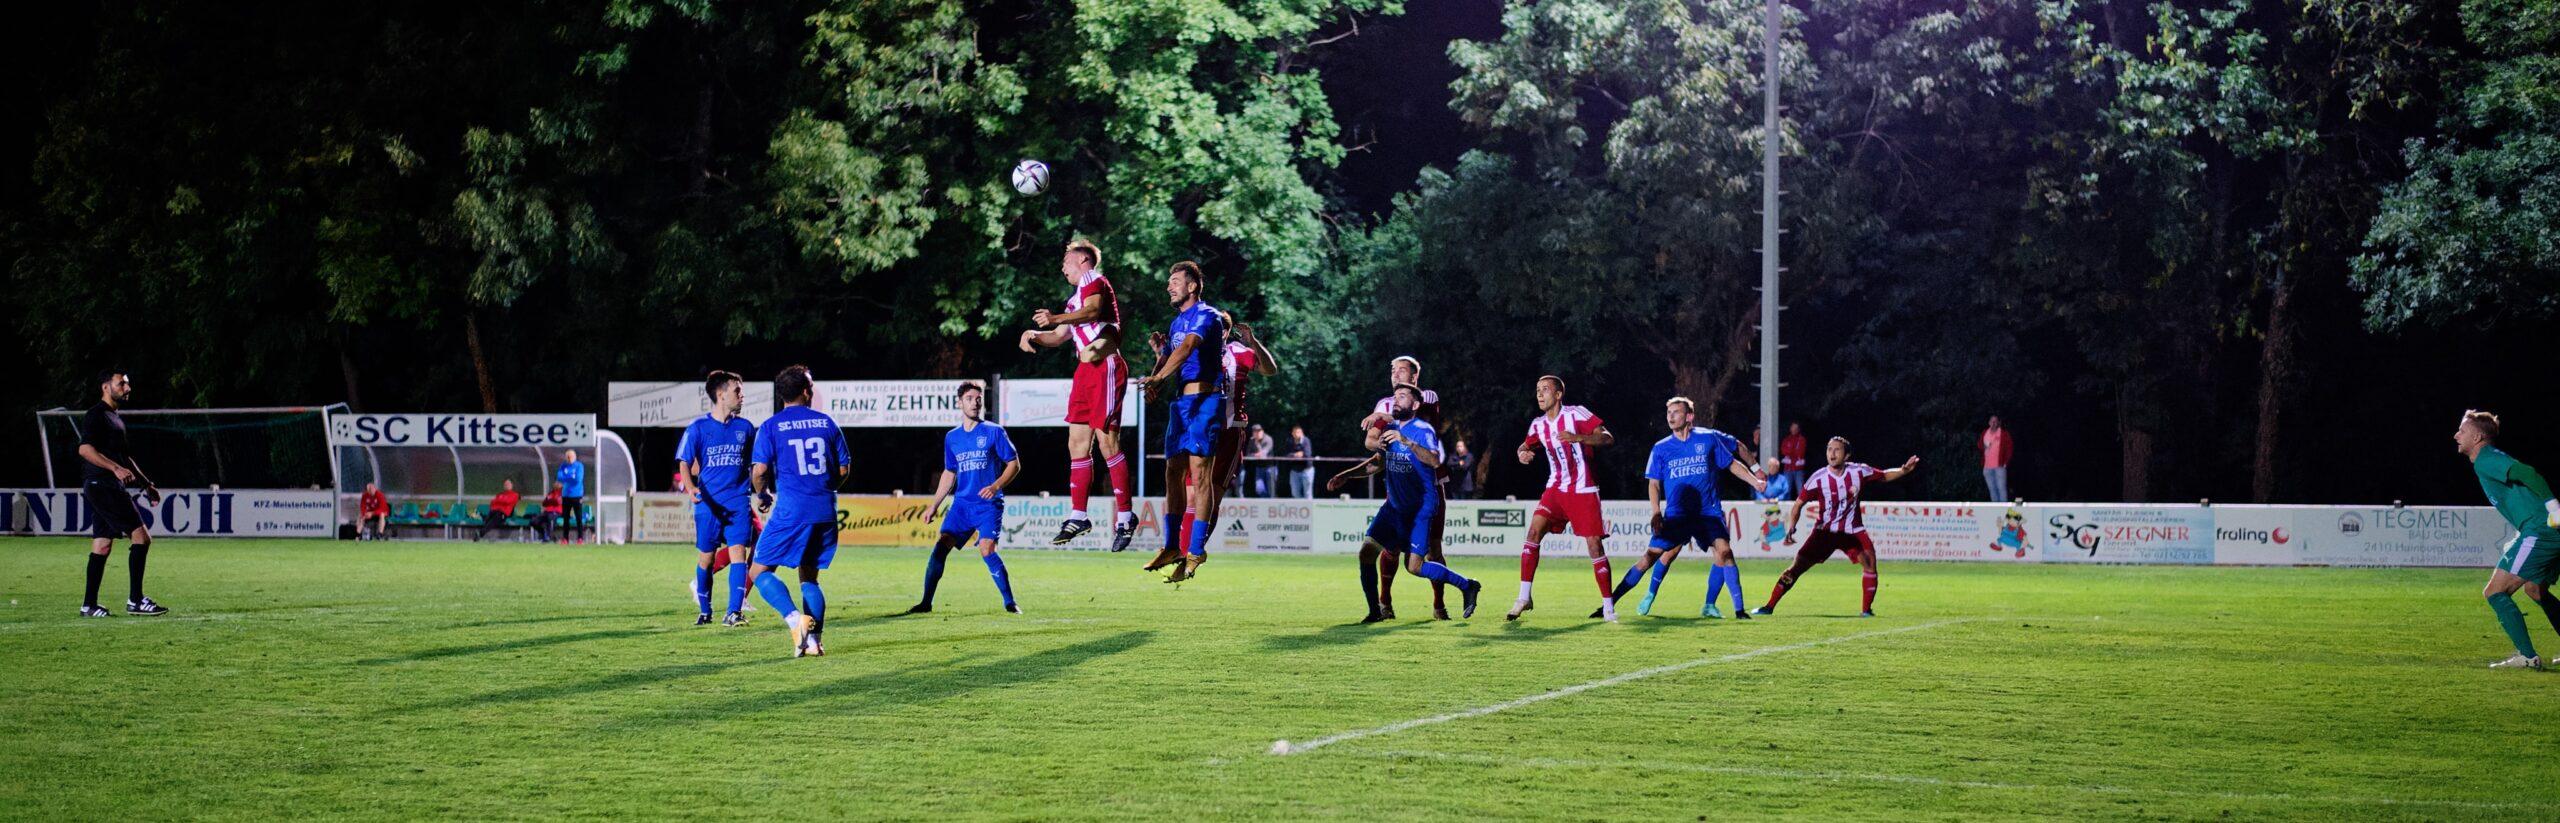 Buliga and Machovec compete for a header